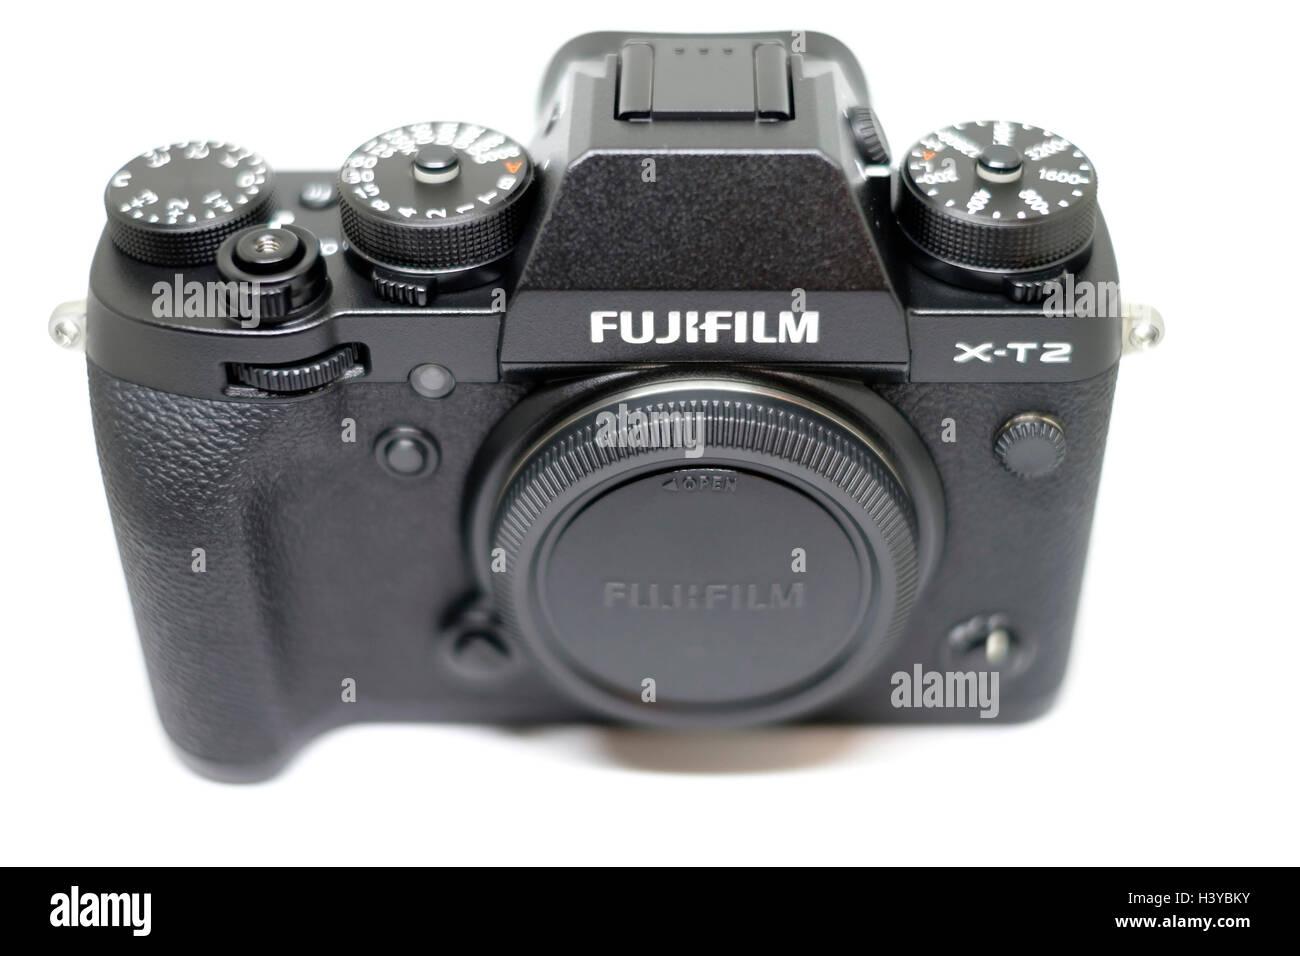 Fujifilm X-T2 digital mirrorless camera - Stock Image